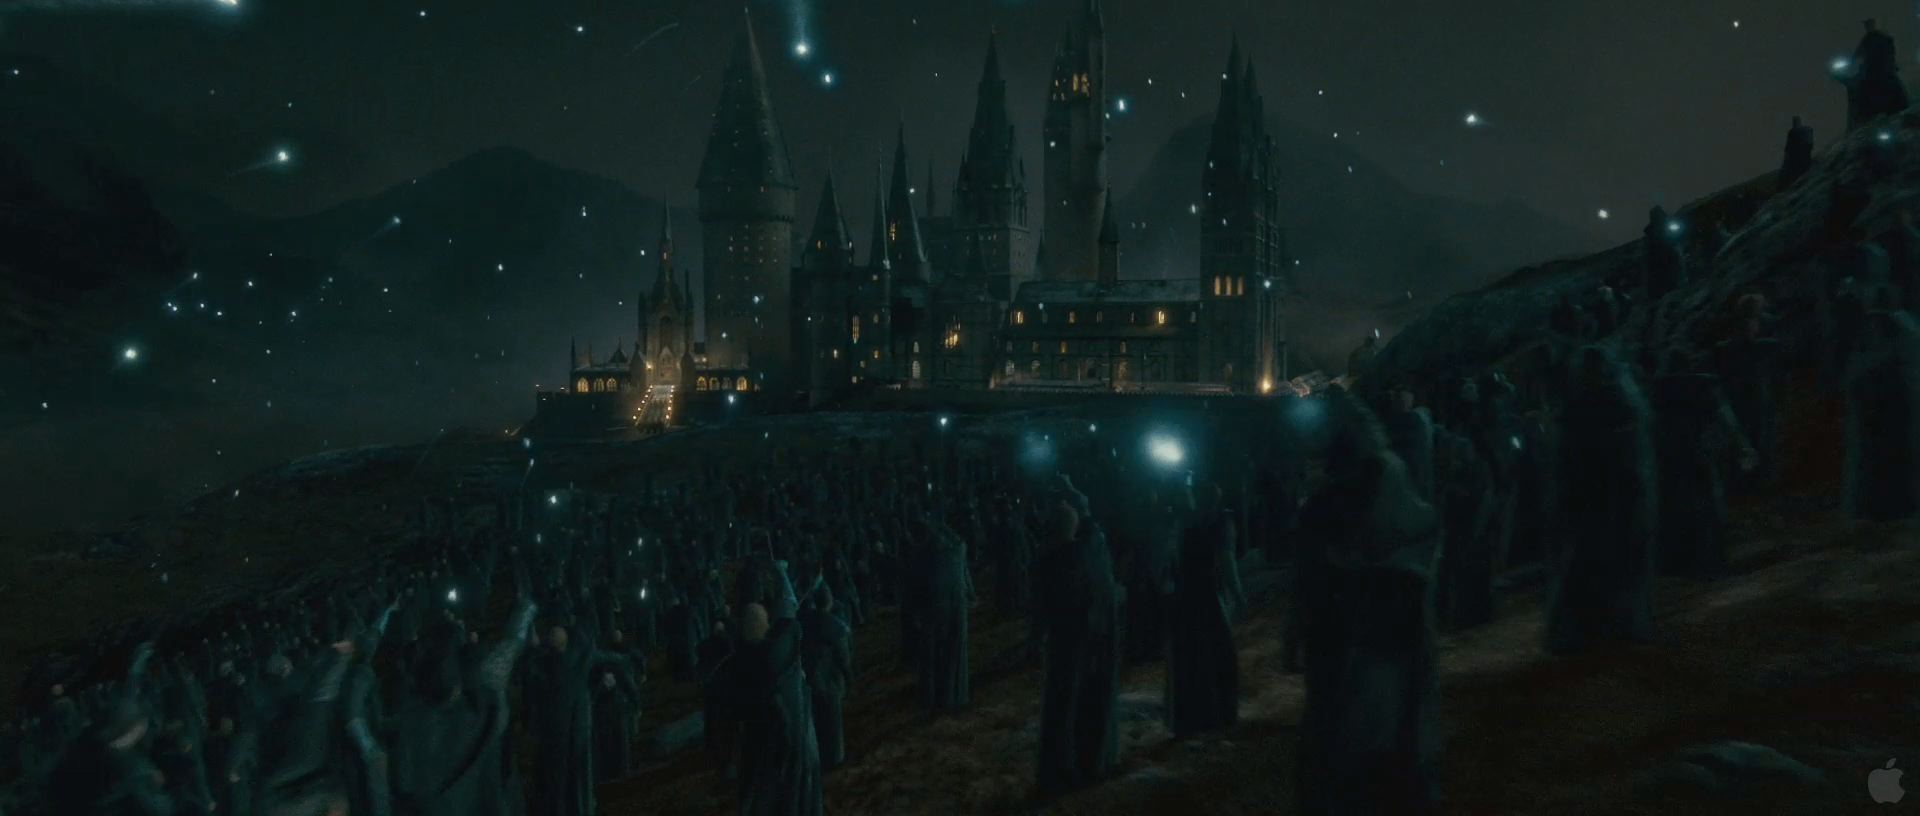 Harry Potter BlogHogwarts HP7 2 Trailer 88